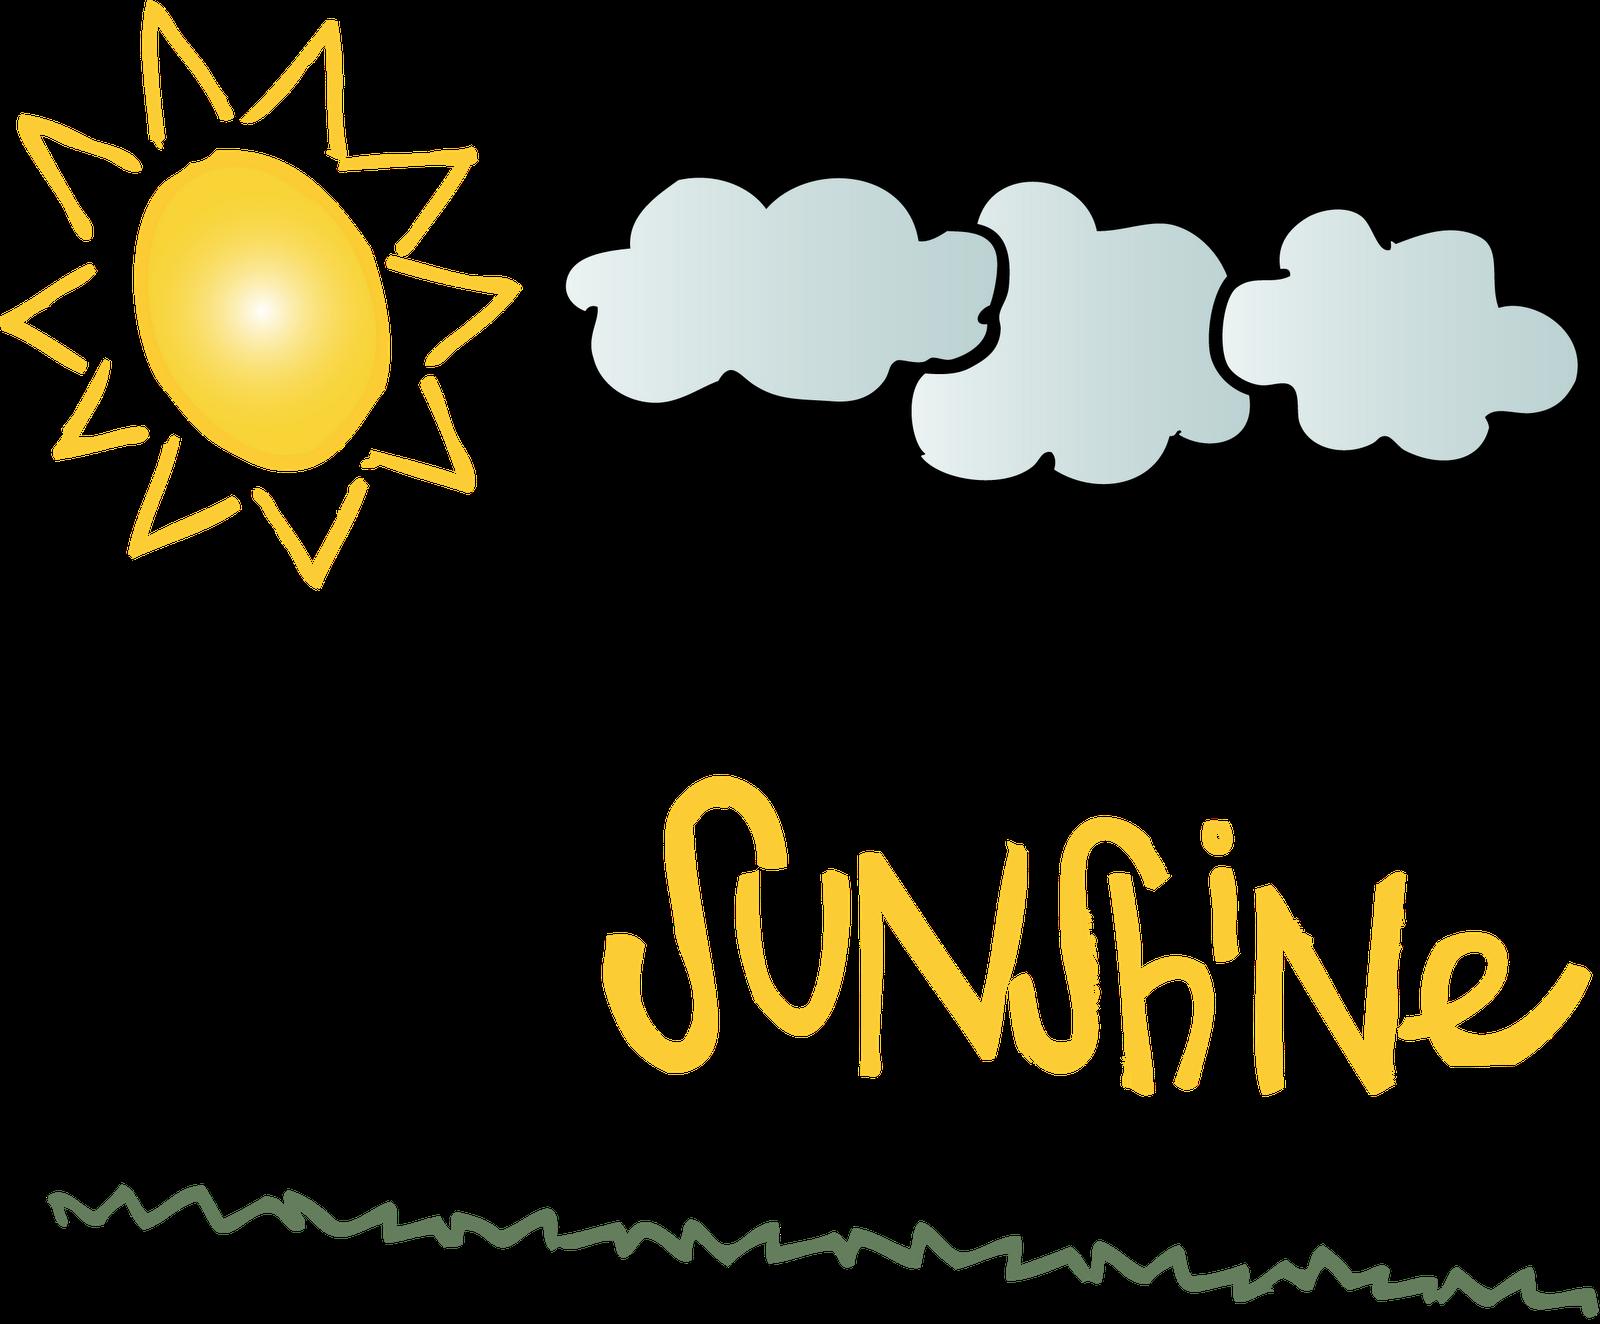 Baby Footprint Art - You Are My Sunshine Art Print - Yellow and Gray    You Are My Sunshine My Only Sunshine Tumblr